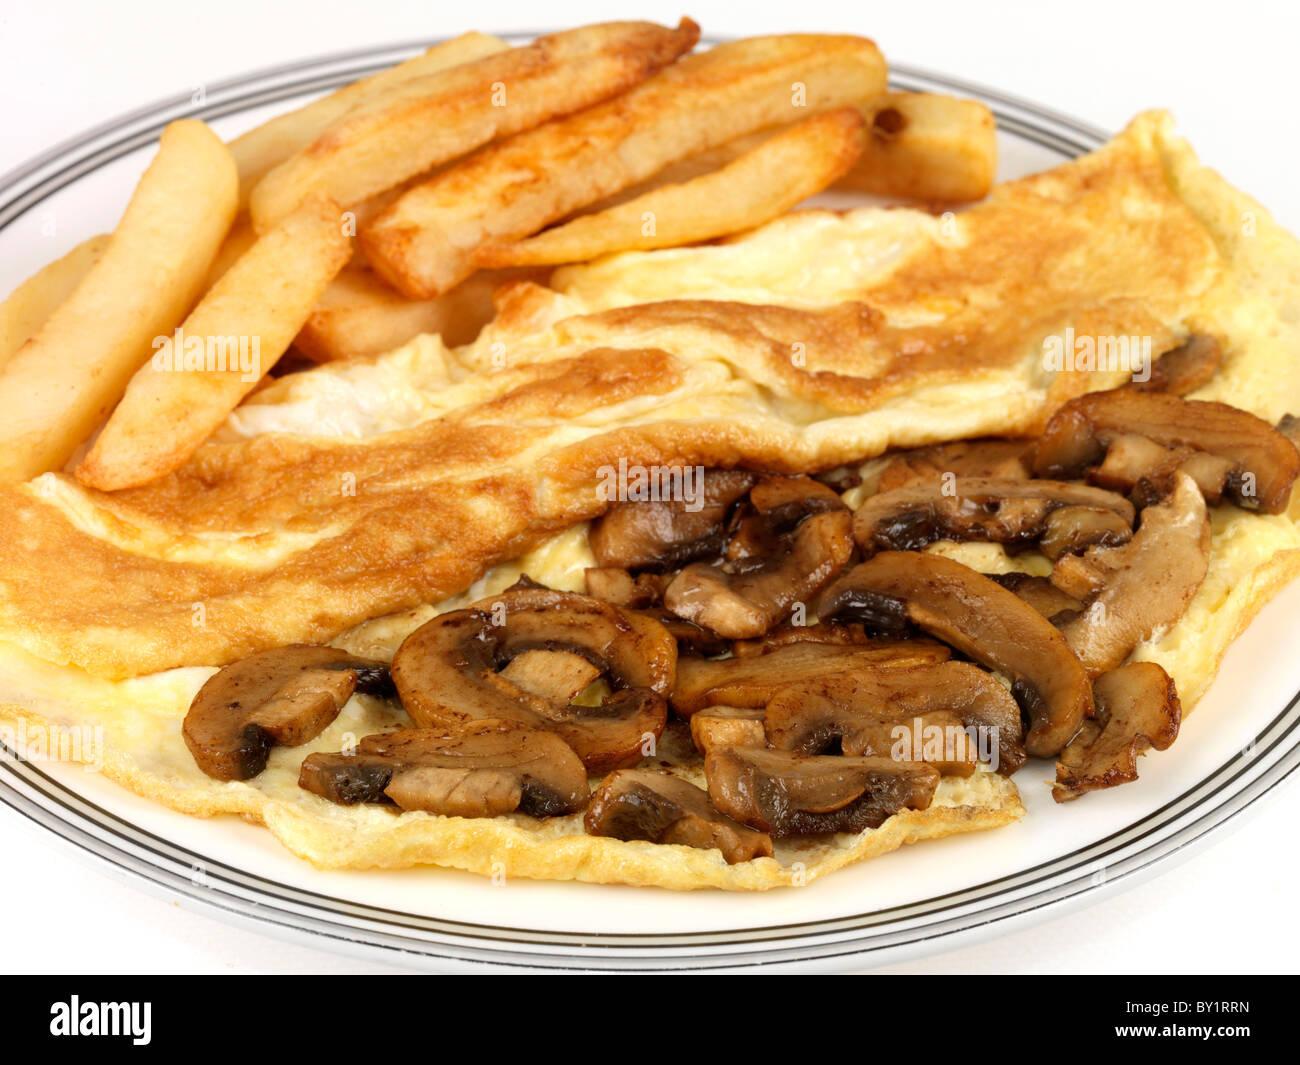 Mushroom Omelette with Chips - Stock Image